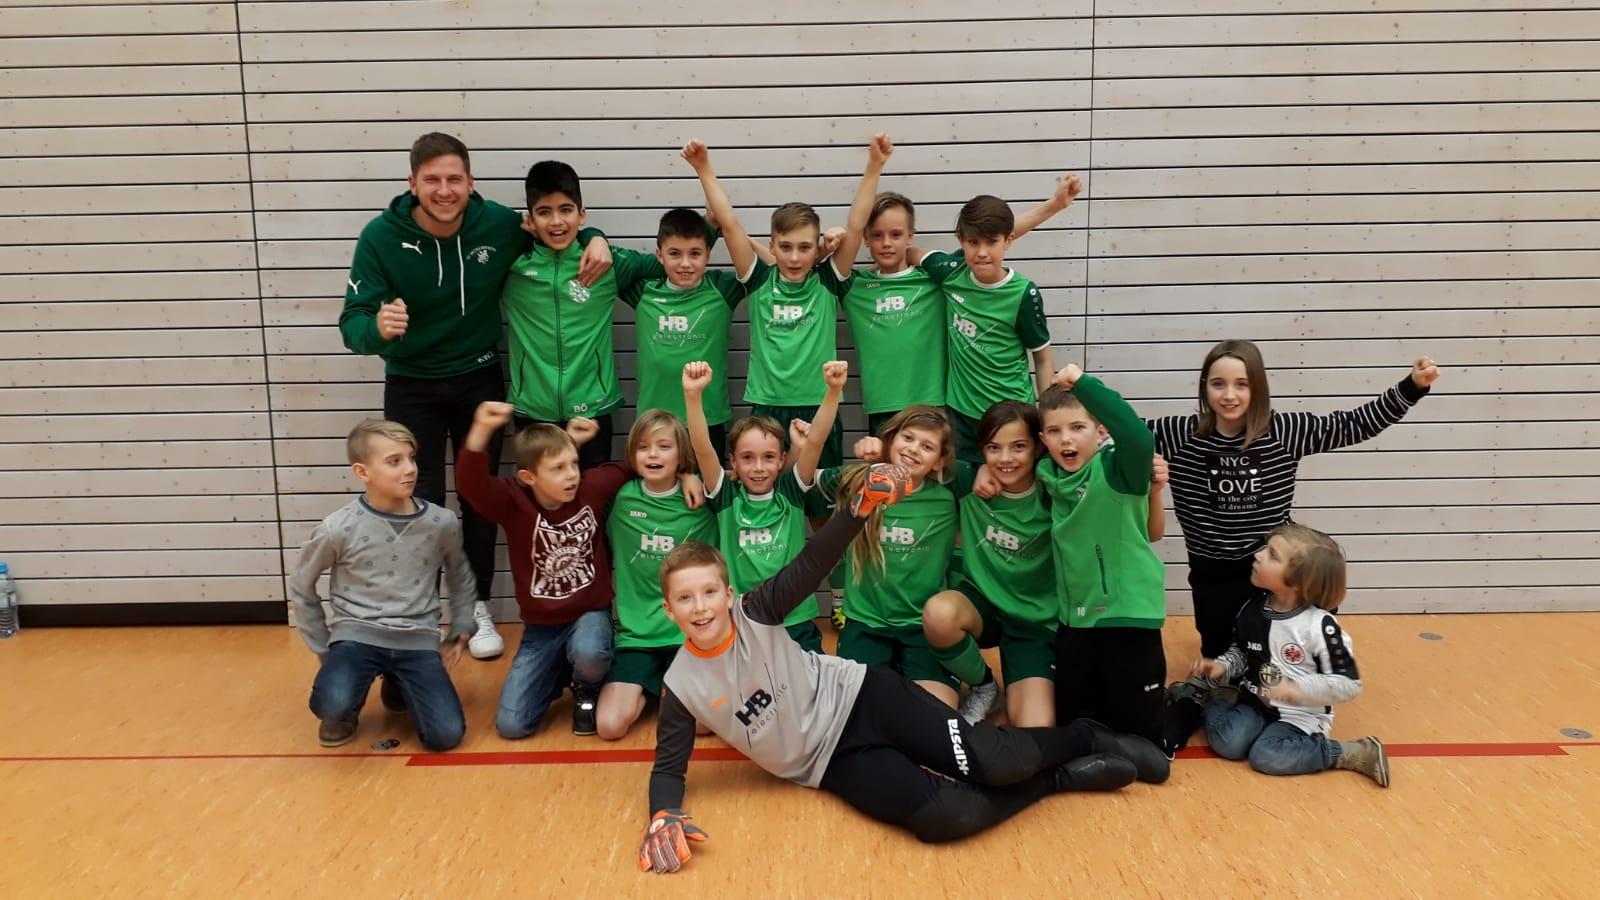 E1-Jugend Hobbyturnier beim TSV Wildberg